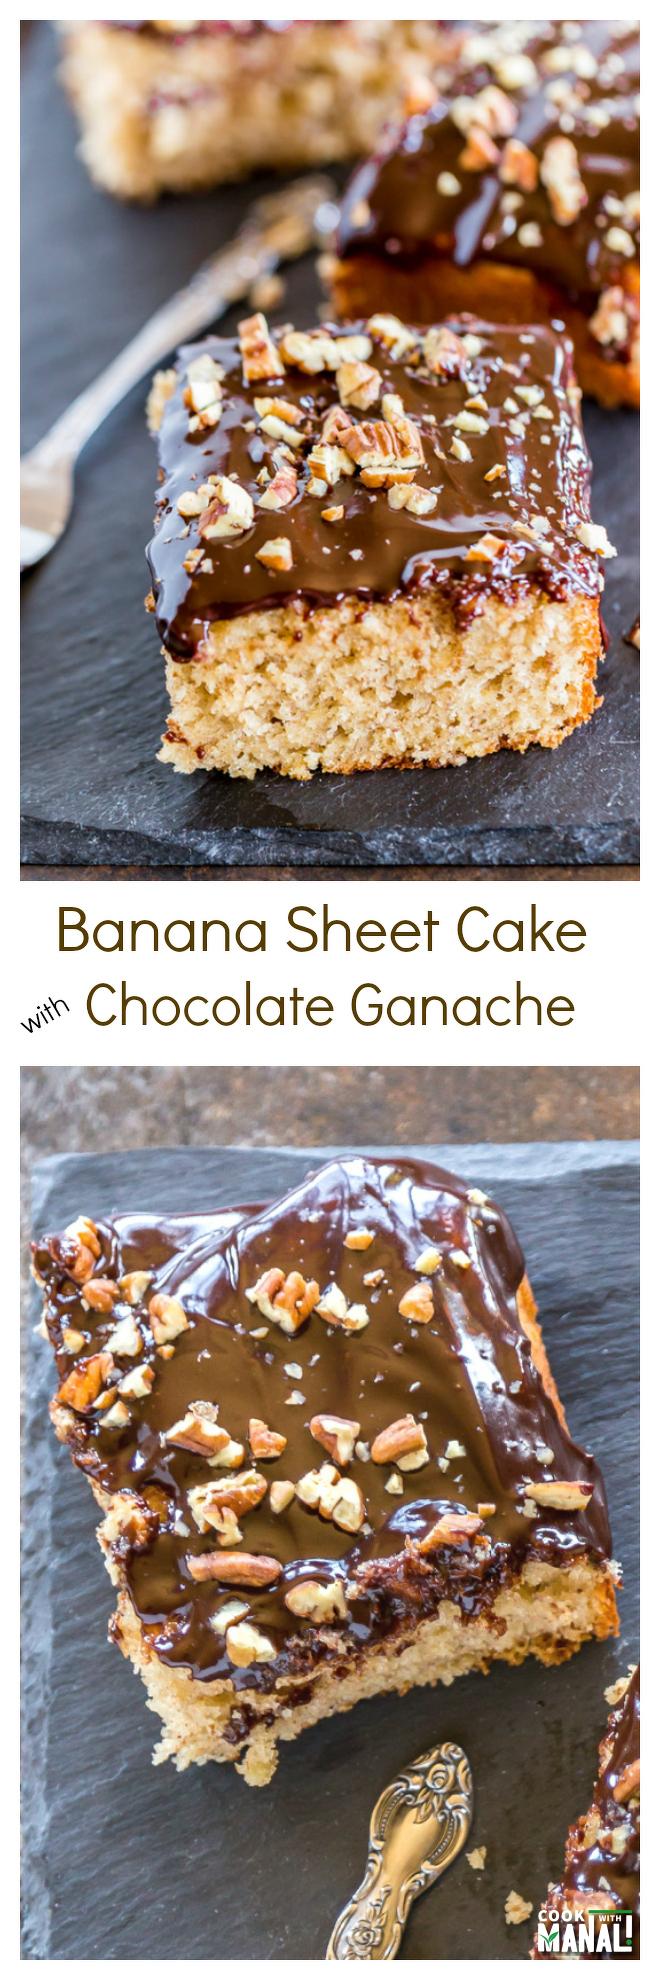 Banana Sheet Cake with Chocolate Ganache Collage